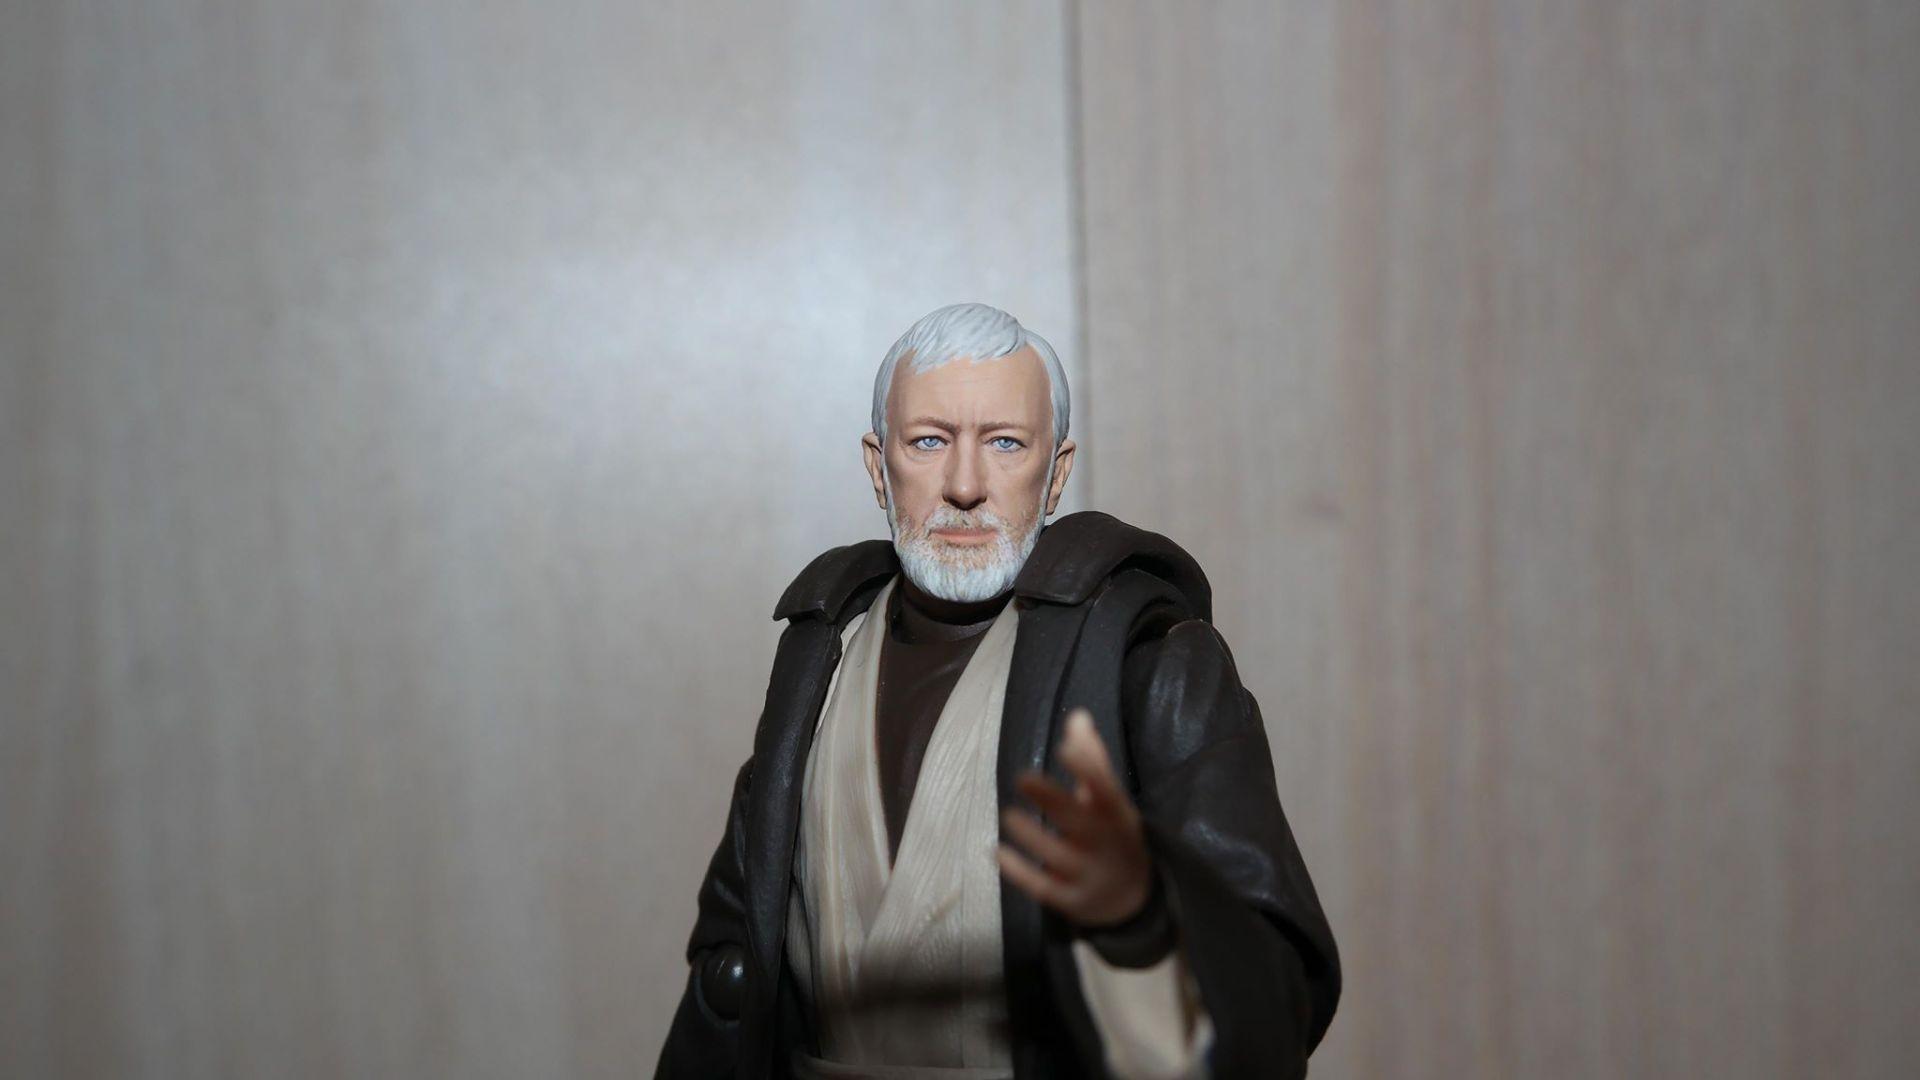 S.H. Figuarts Review | Obi-Wan Kenobi (A New Hope)